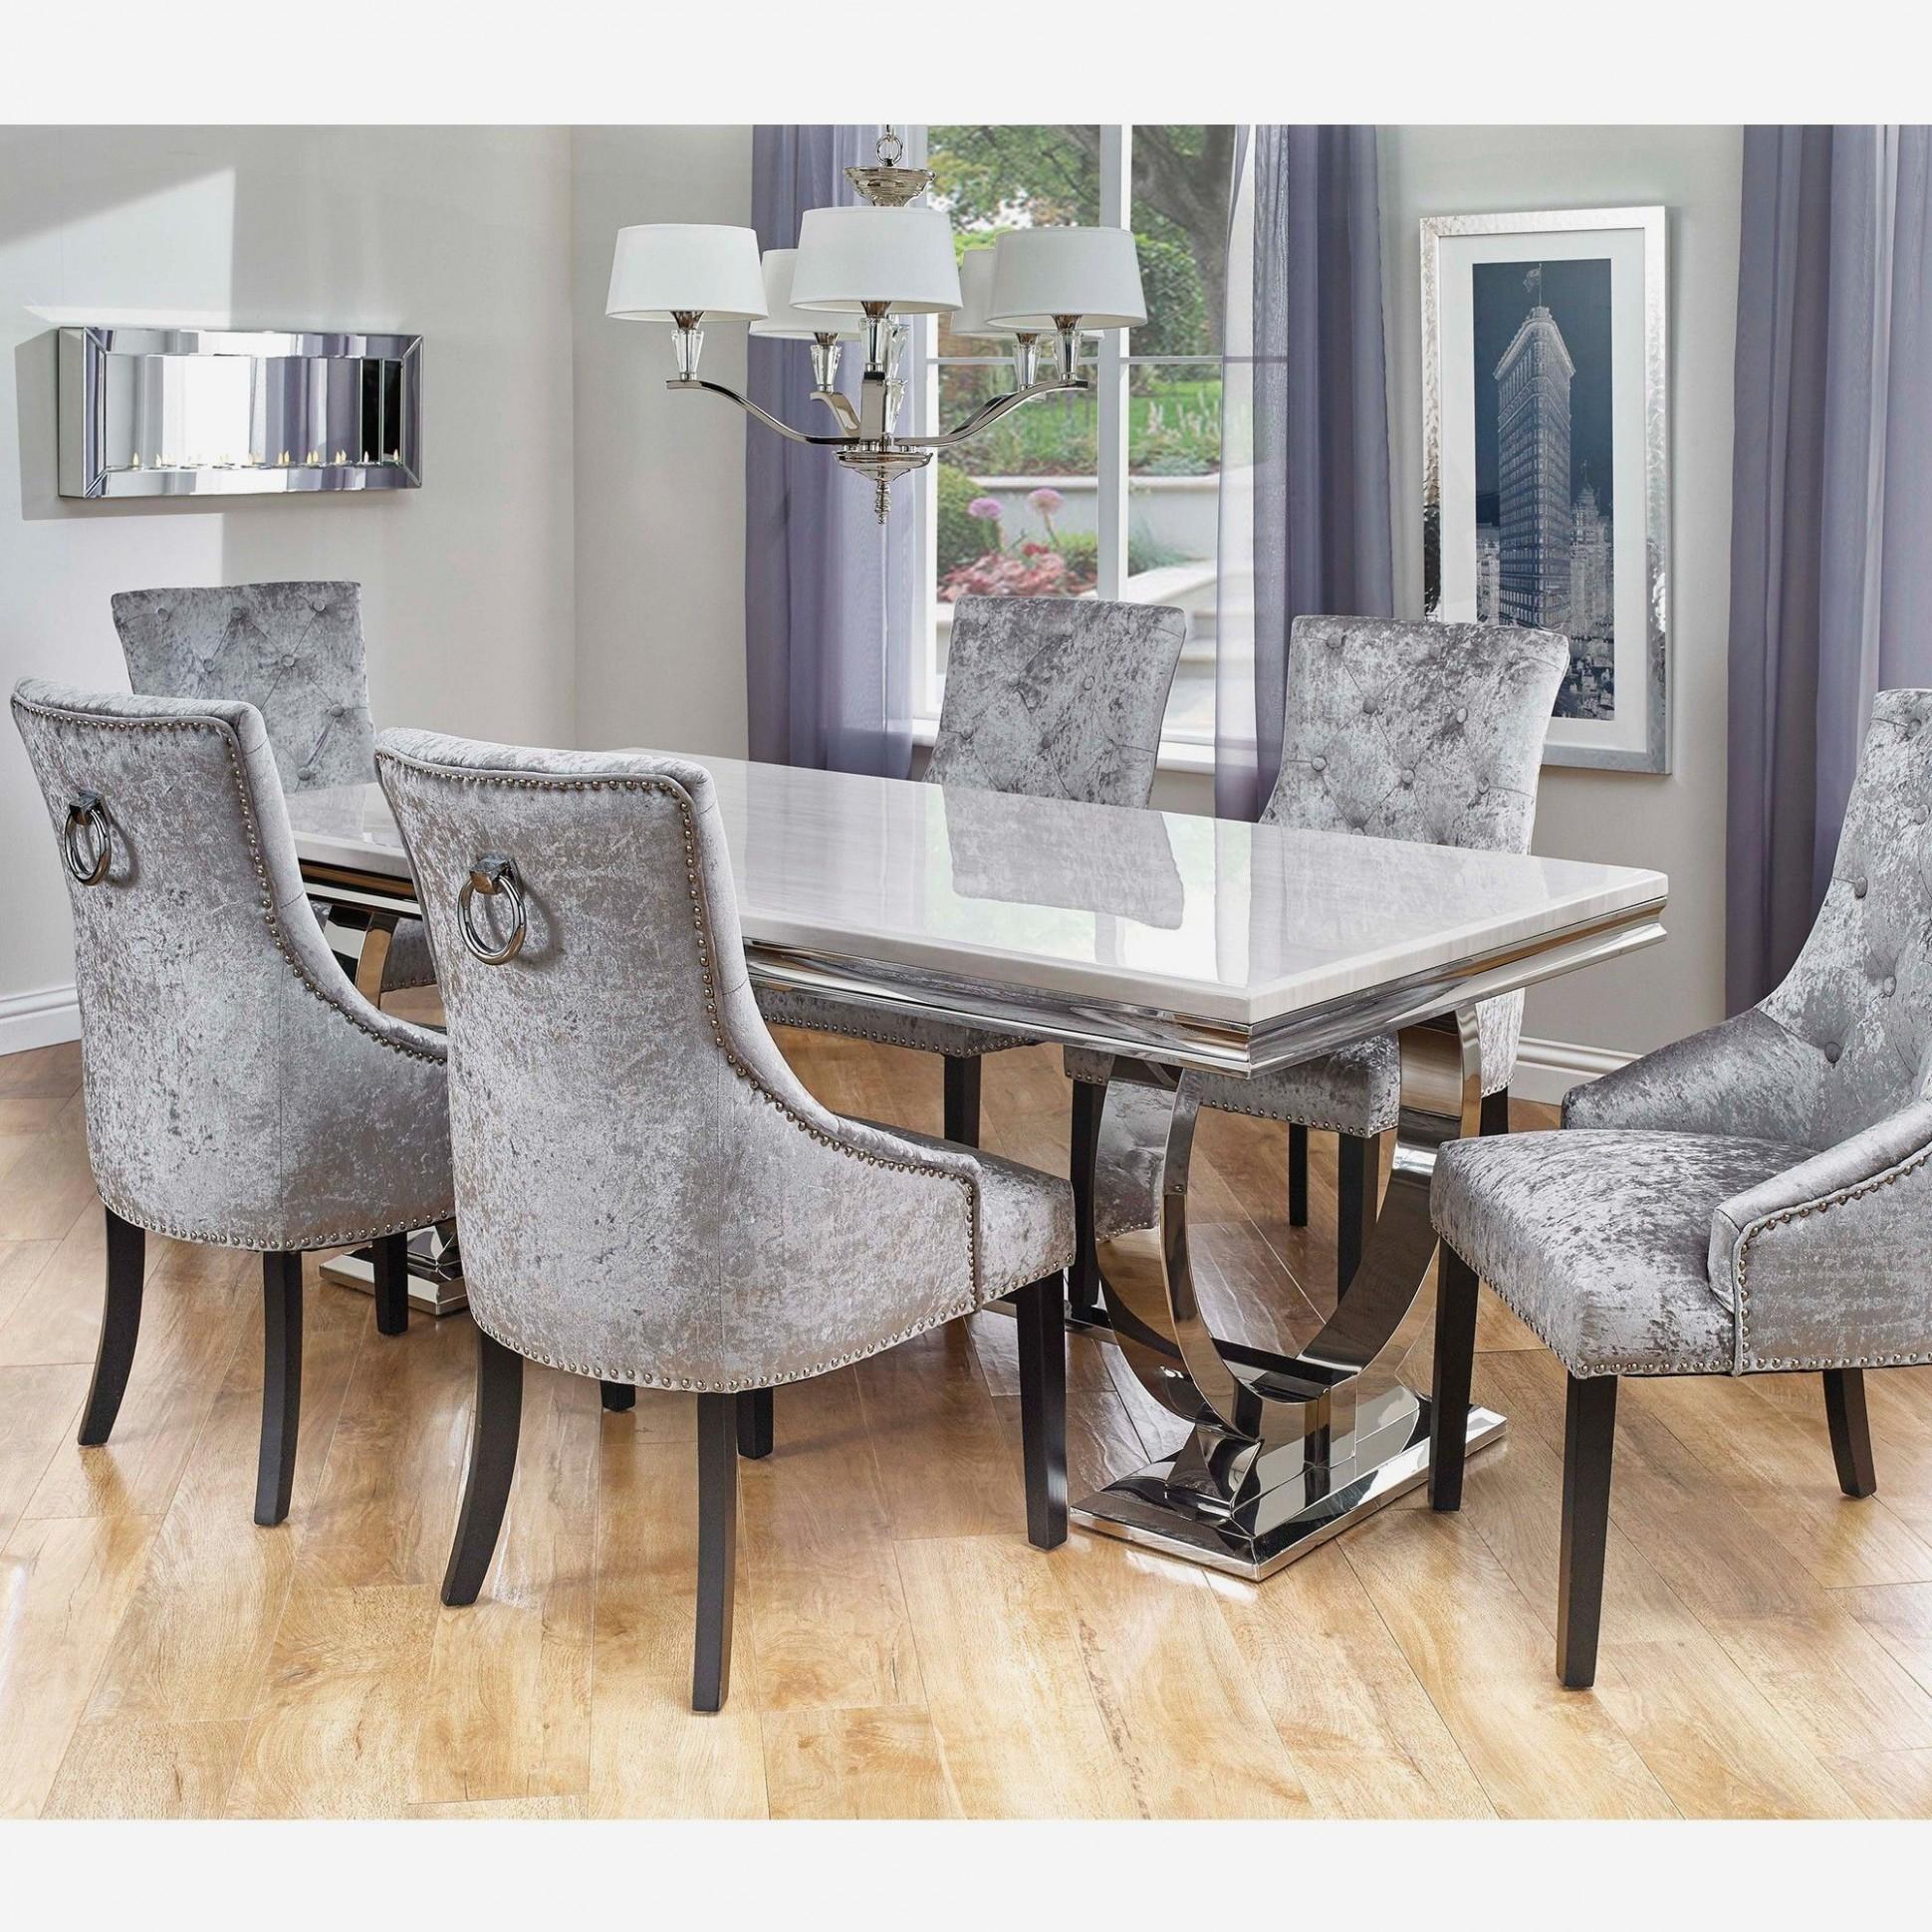 Modern Dining Room Ideas - June, 9  Round dining room, Round  - Dining Room Ideas Uk 2018